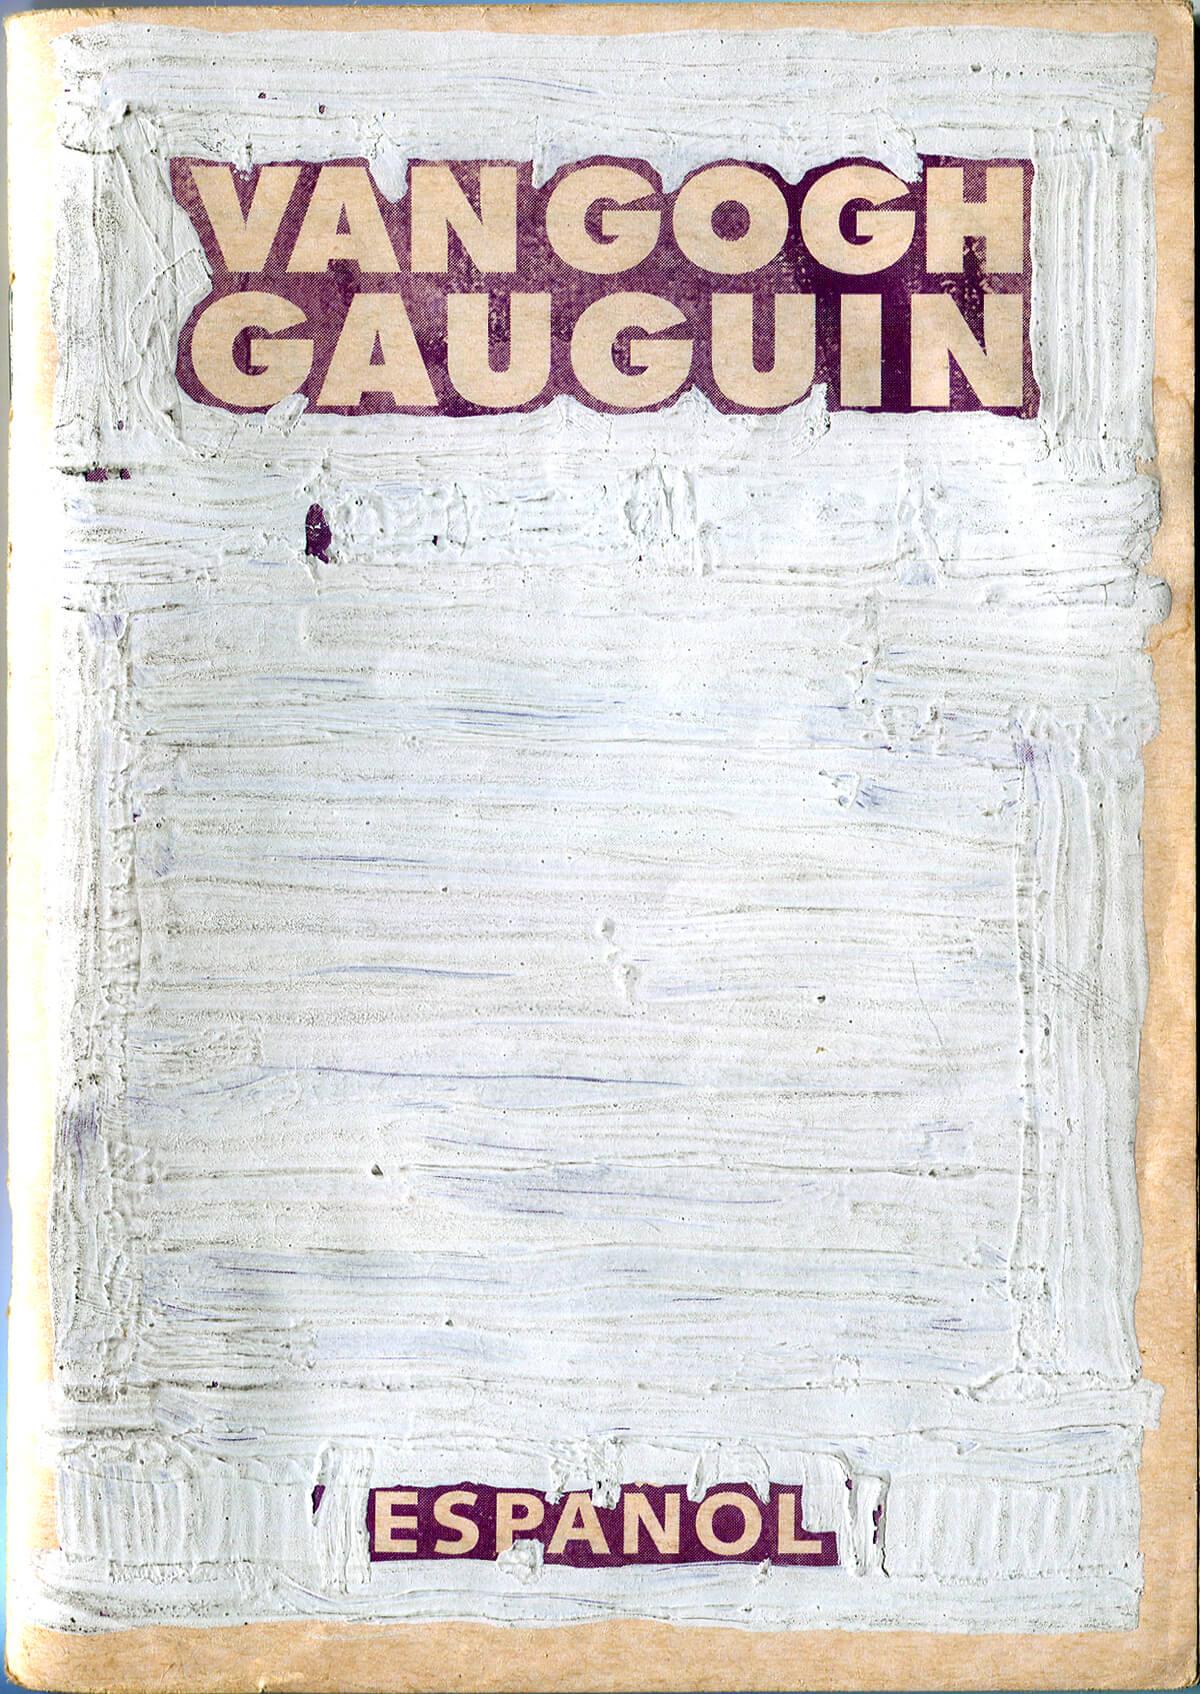 Van Gogh&Gauguin: Graffiti, versión Español, cover, 15 x 10.4 cm, 2002